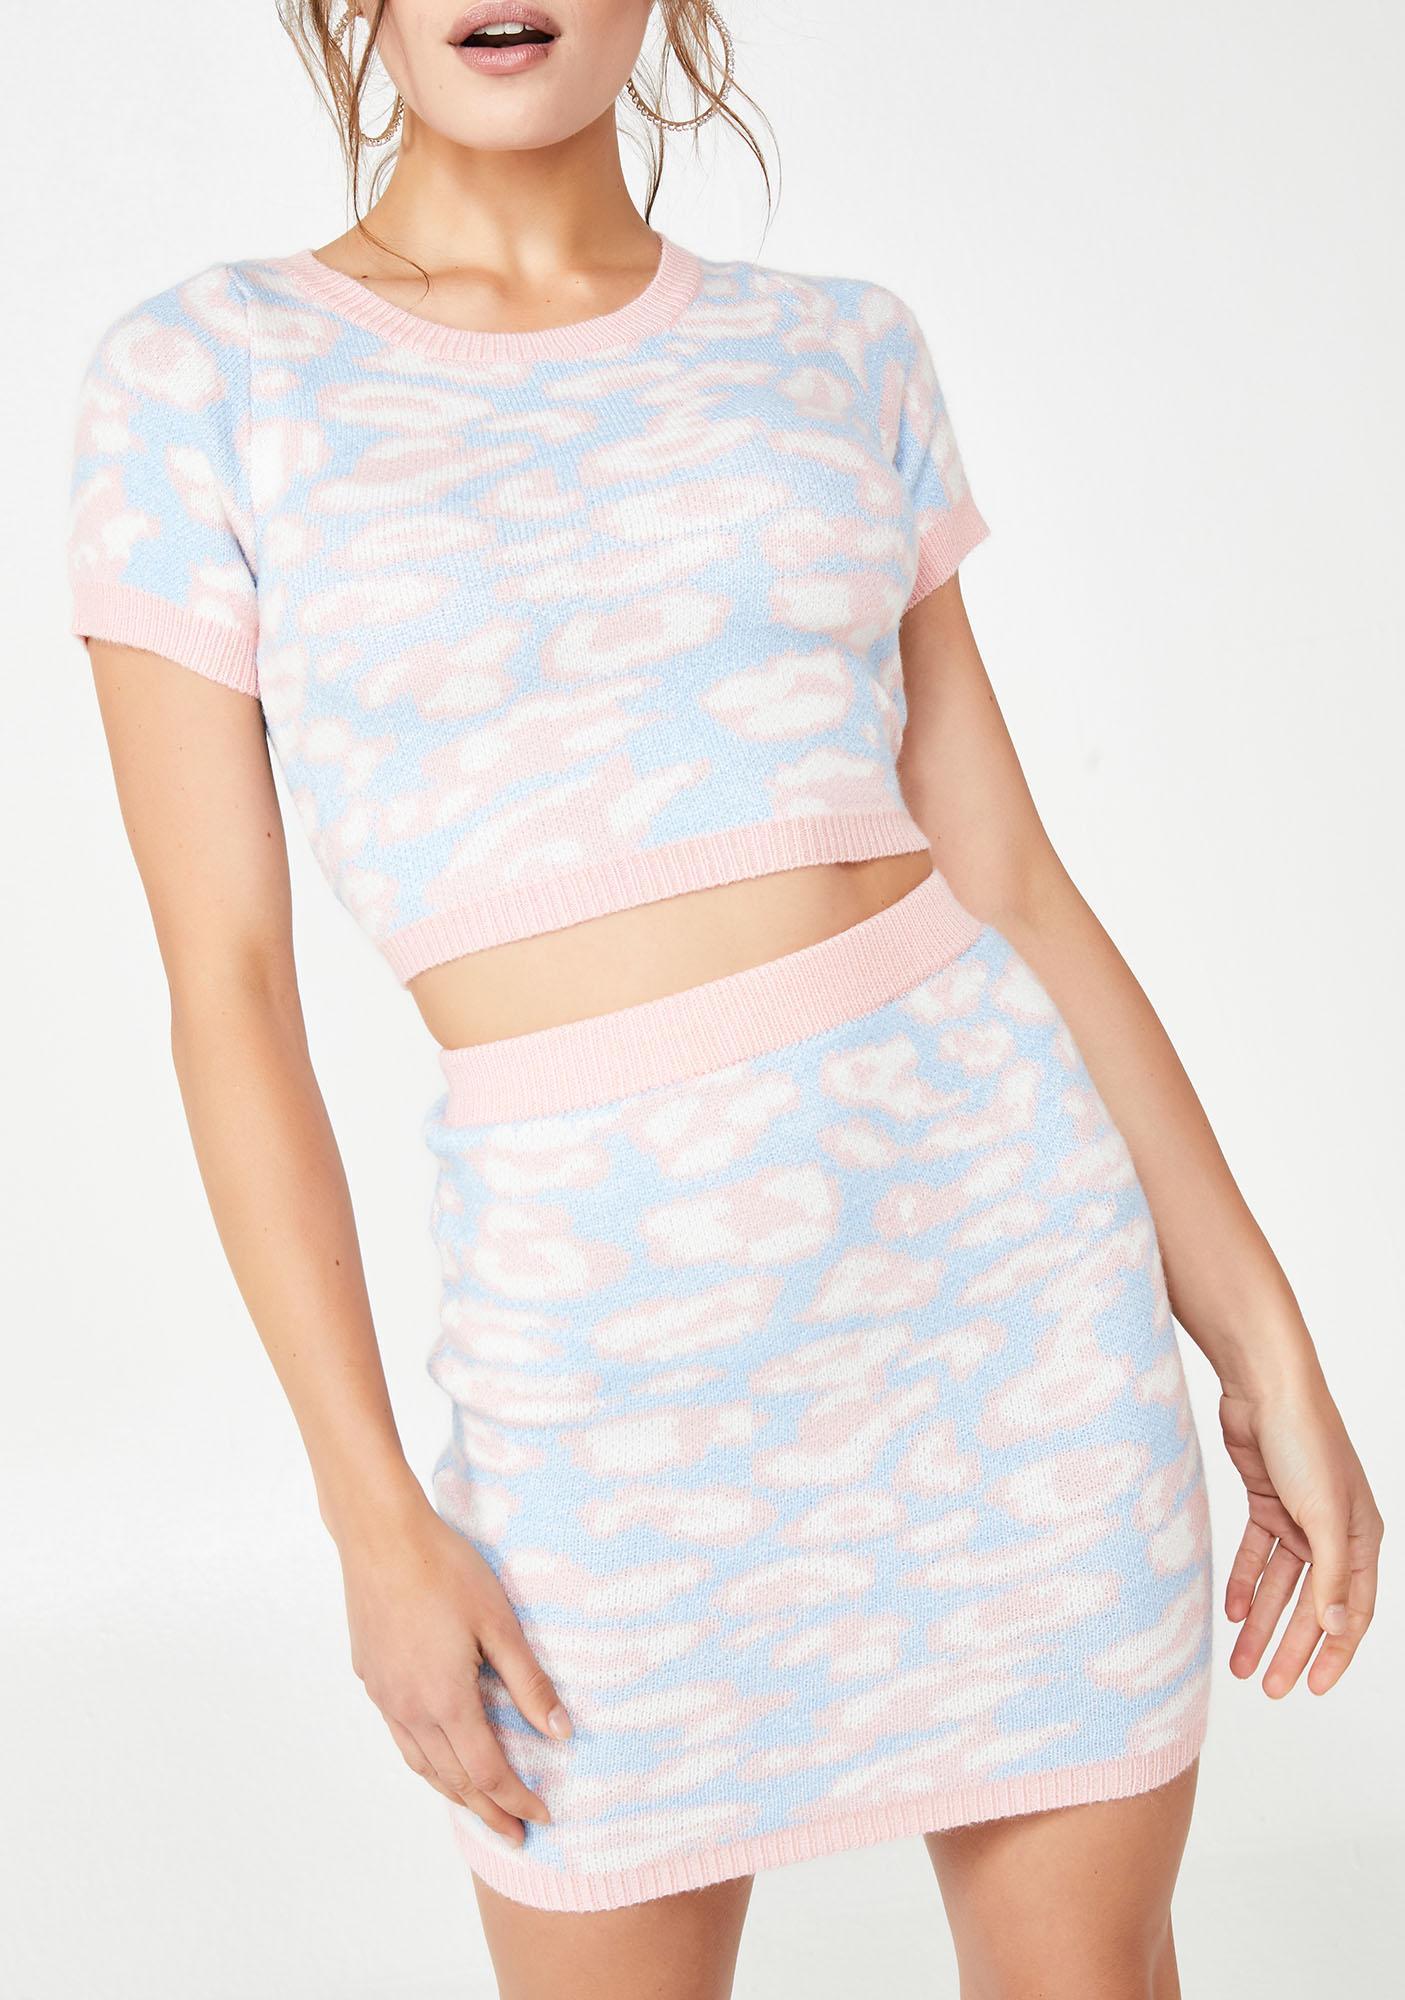 Catty Vibez Skirt Set